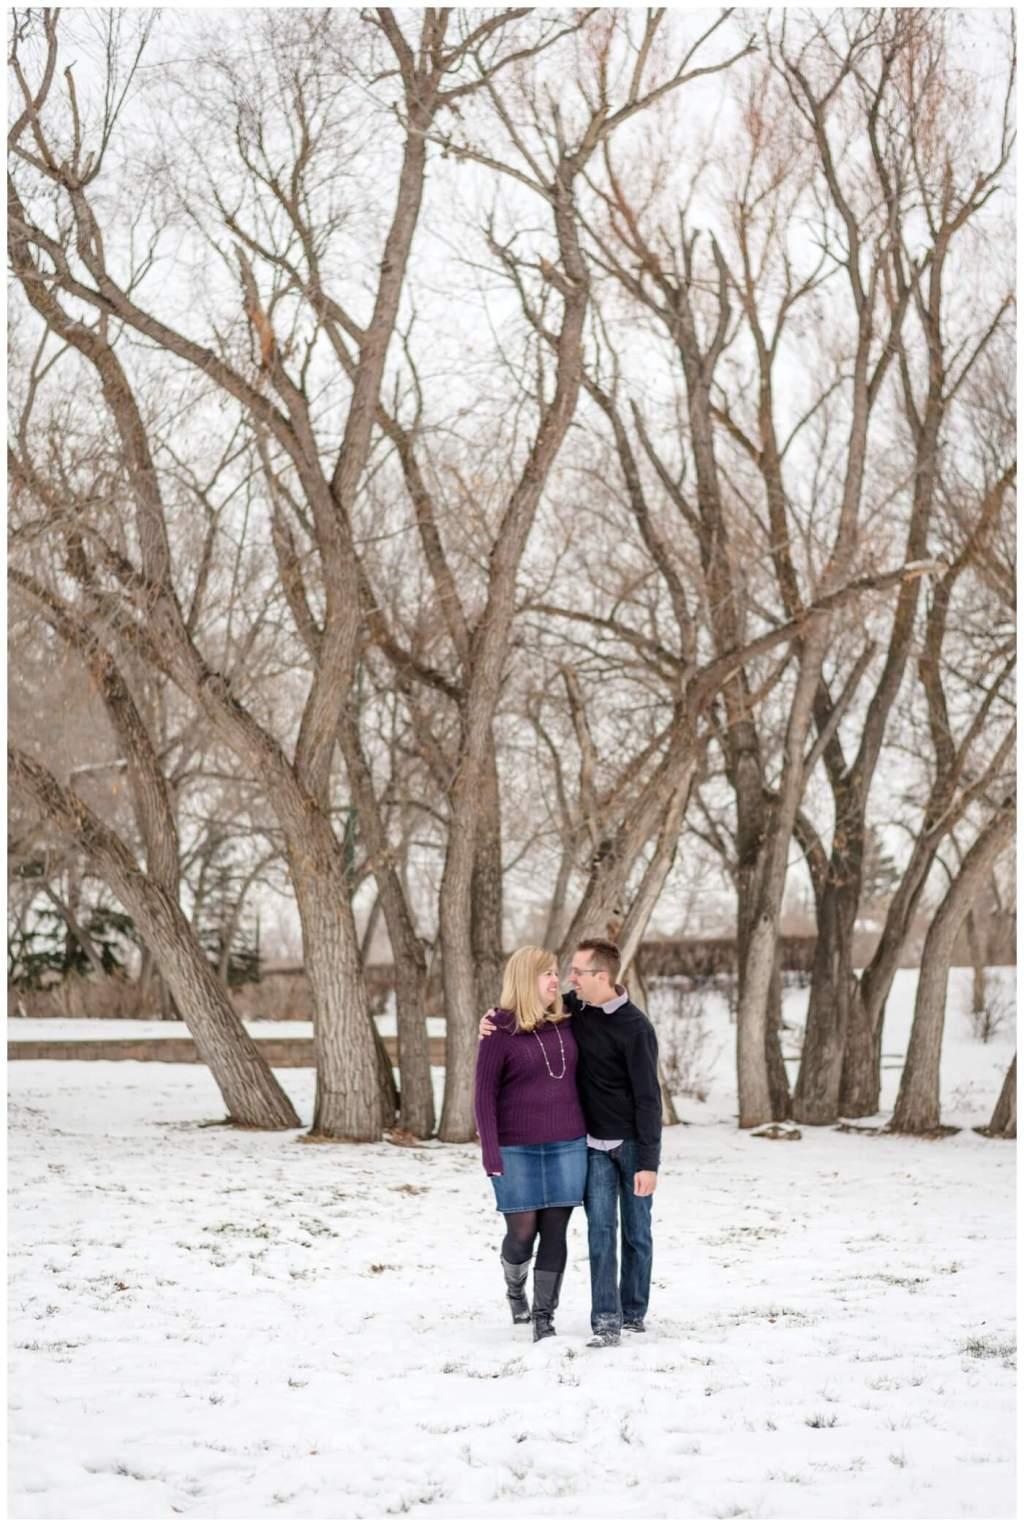 Regina Engagement Photographer - Dave-Sarah - Winter Engagement Session - Kiwanis Park Regina - Giant Trees - Snow